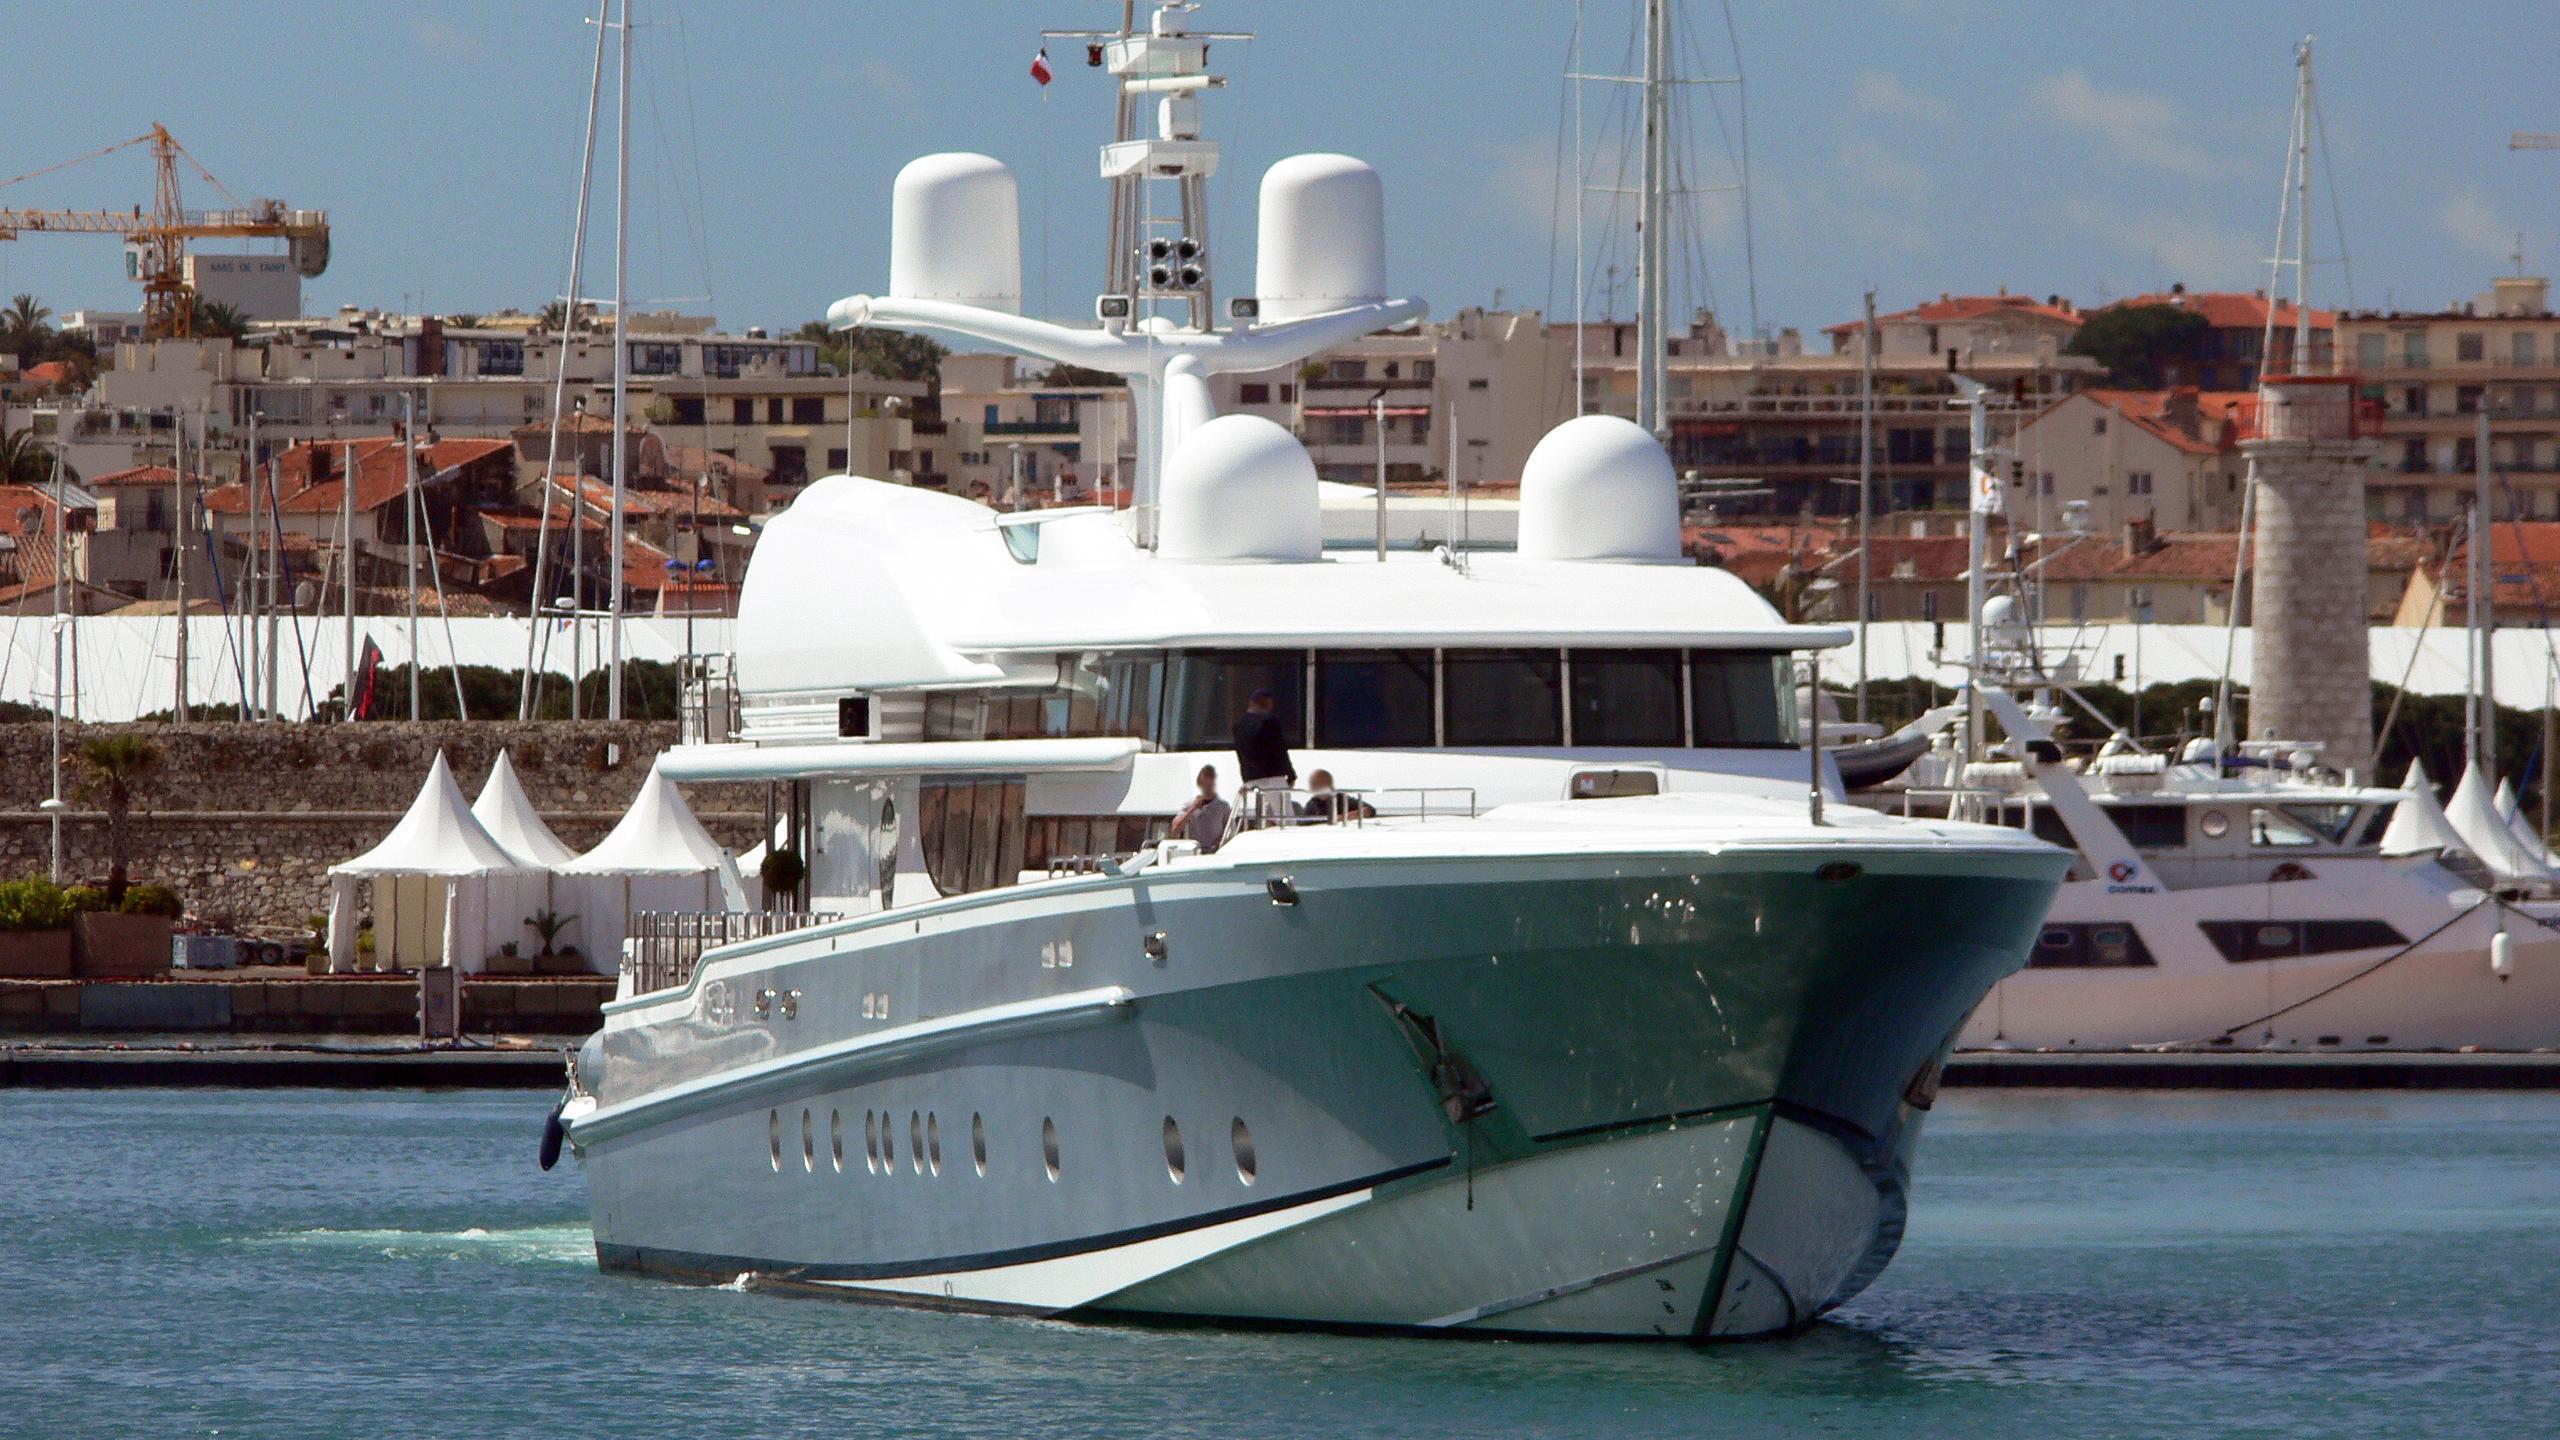 lady-k-motor-yacht-oceanfast-1998-50m-running-bow